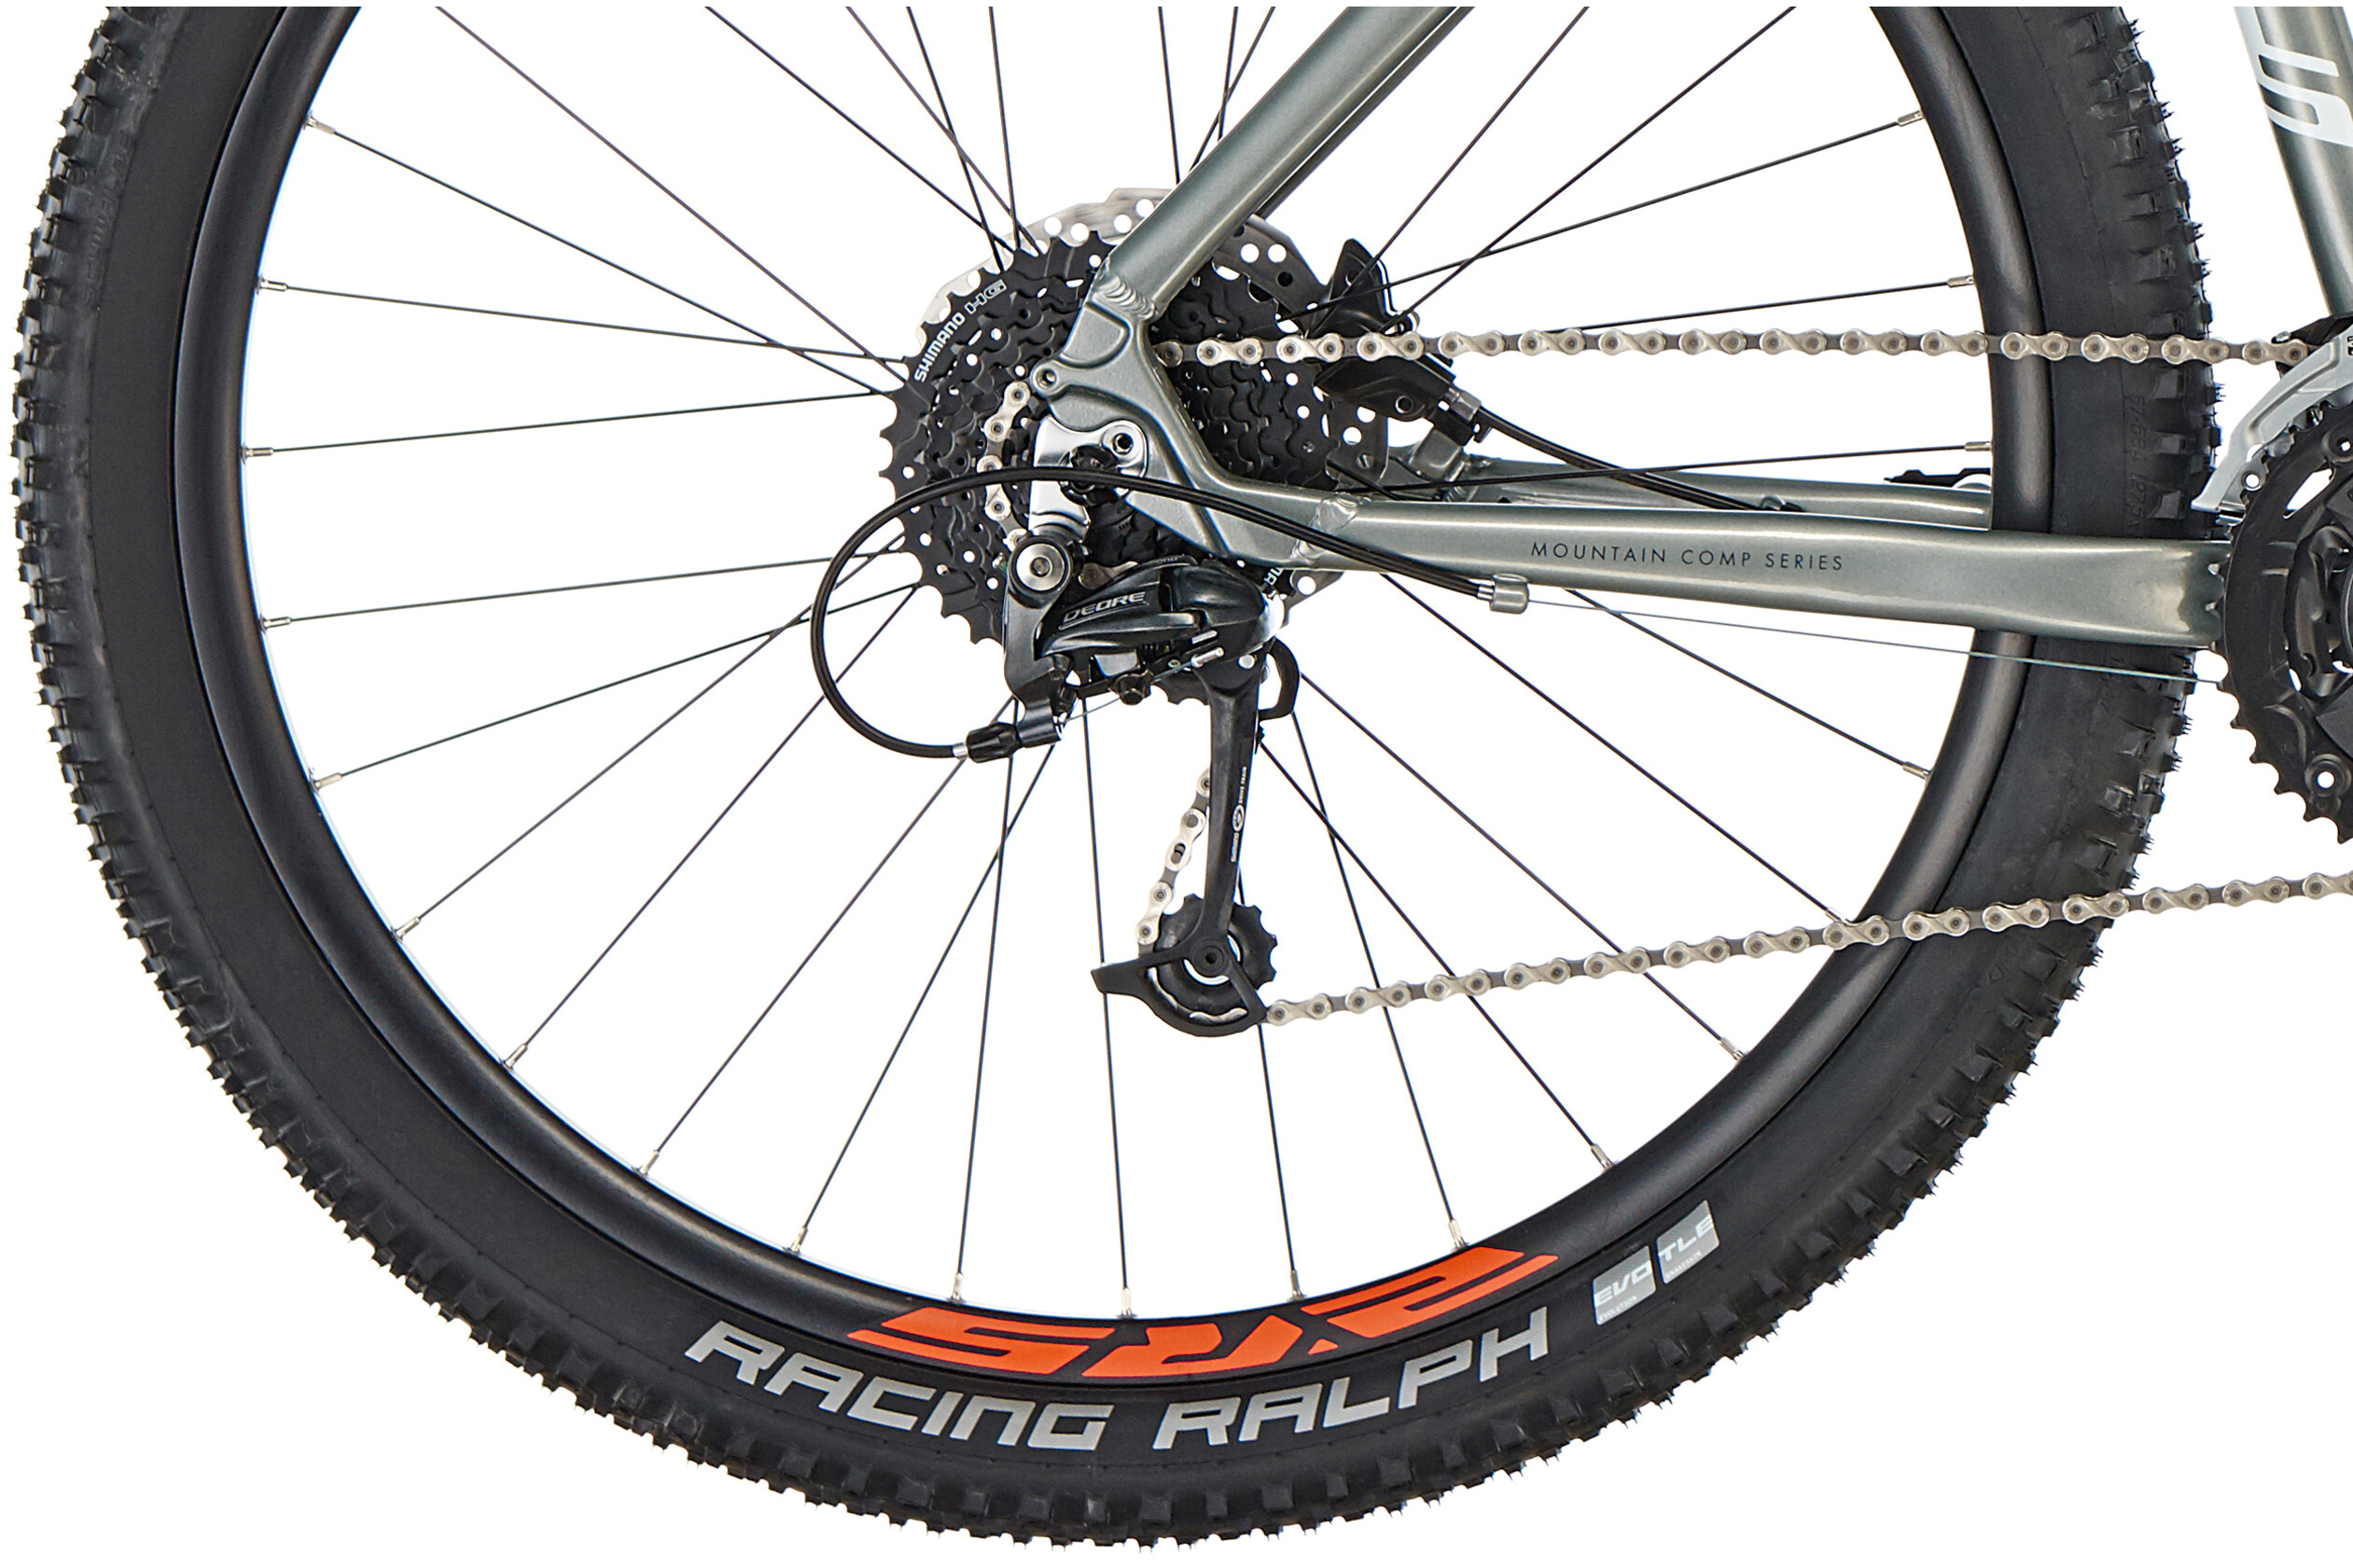 Serious Shoreline 27,5 MTB Hardtail grå | Find cykeltilbehør på nettet | Bikester.dk